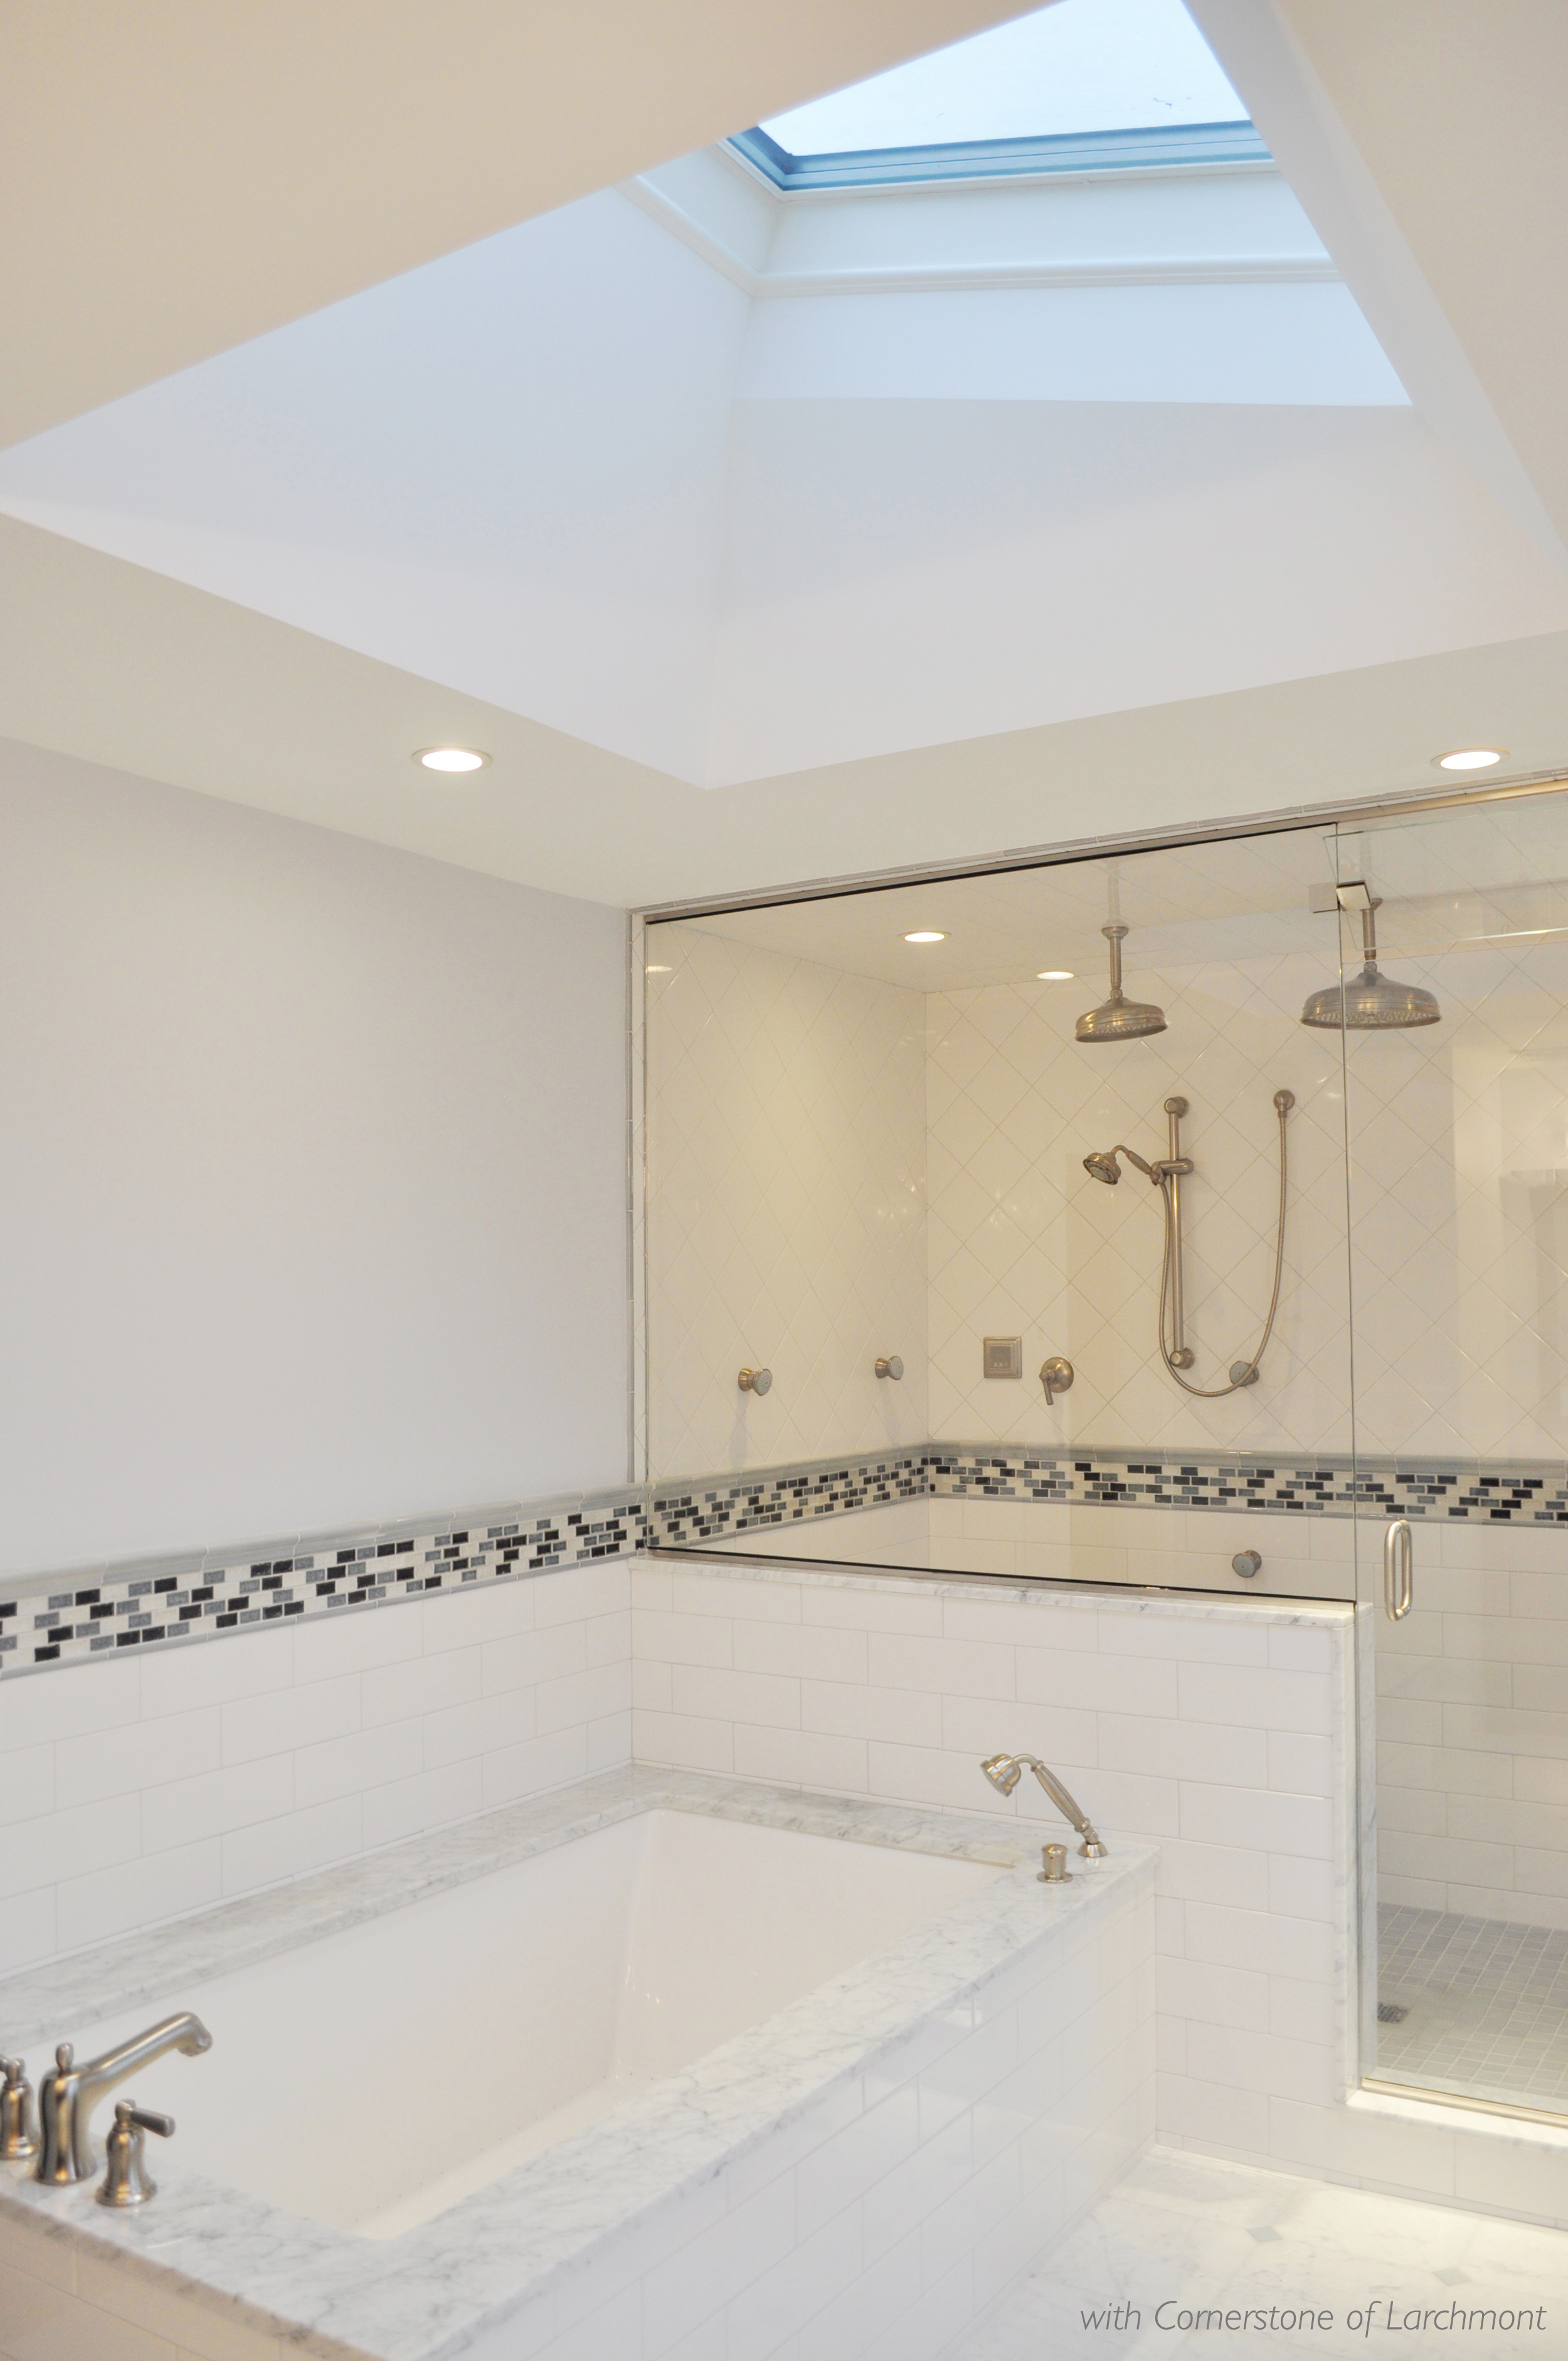 Kim Annick Mitchell_Interior Designer_Master Bathroom_Marble Surround Tub_ Glass Mosaic Tile Chair Rail Detail_Steam Shower_Skylight.jpg